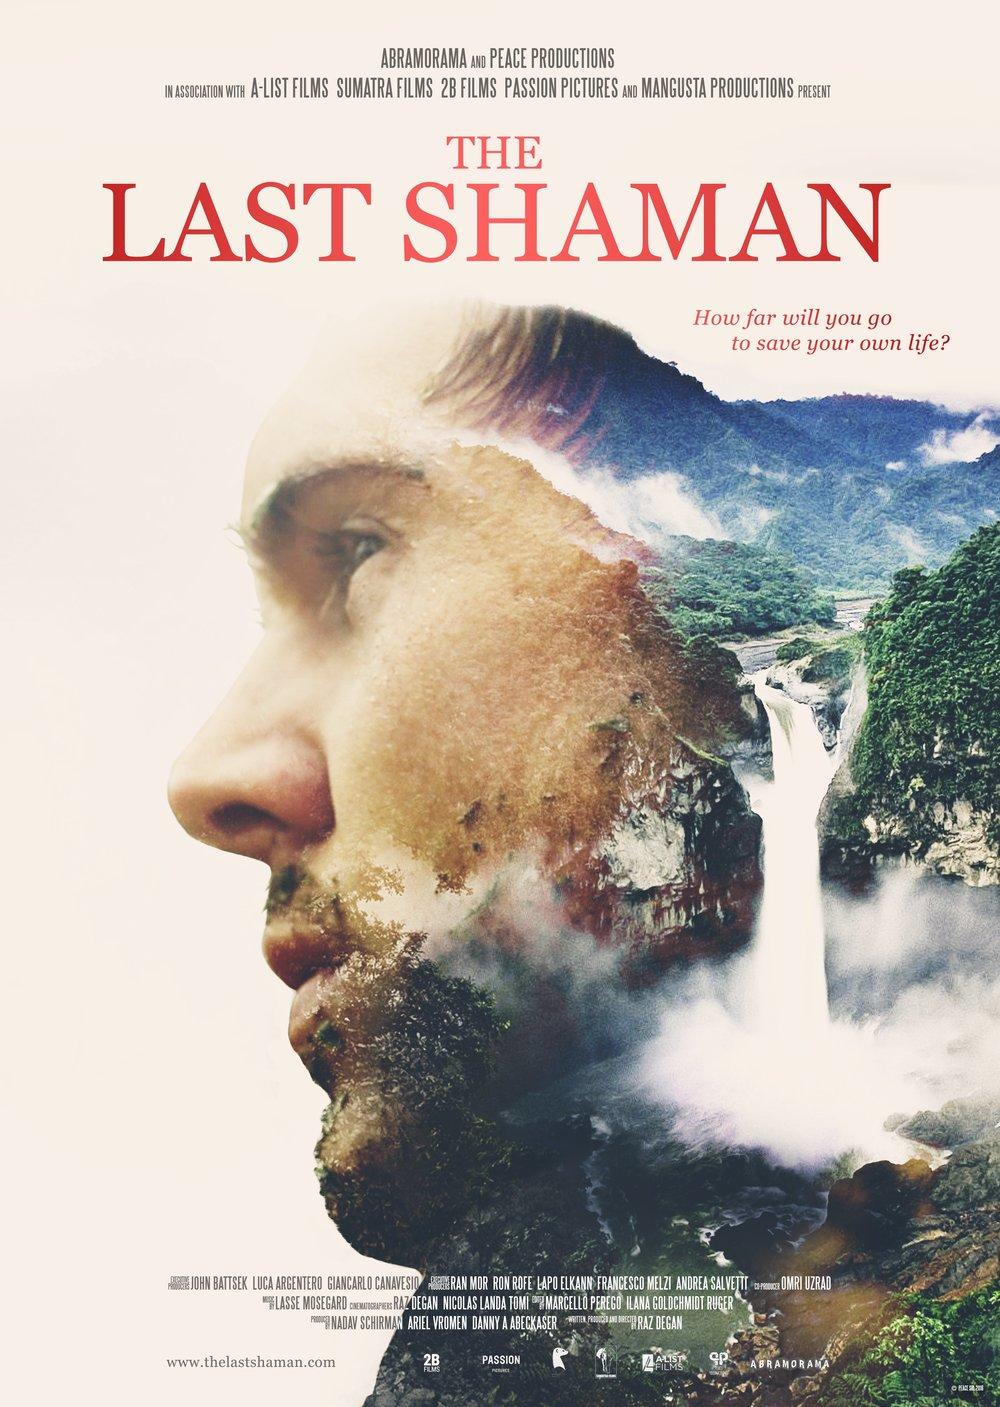 The Last Shaman - poster.jpg